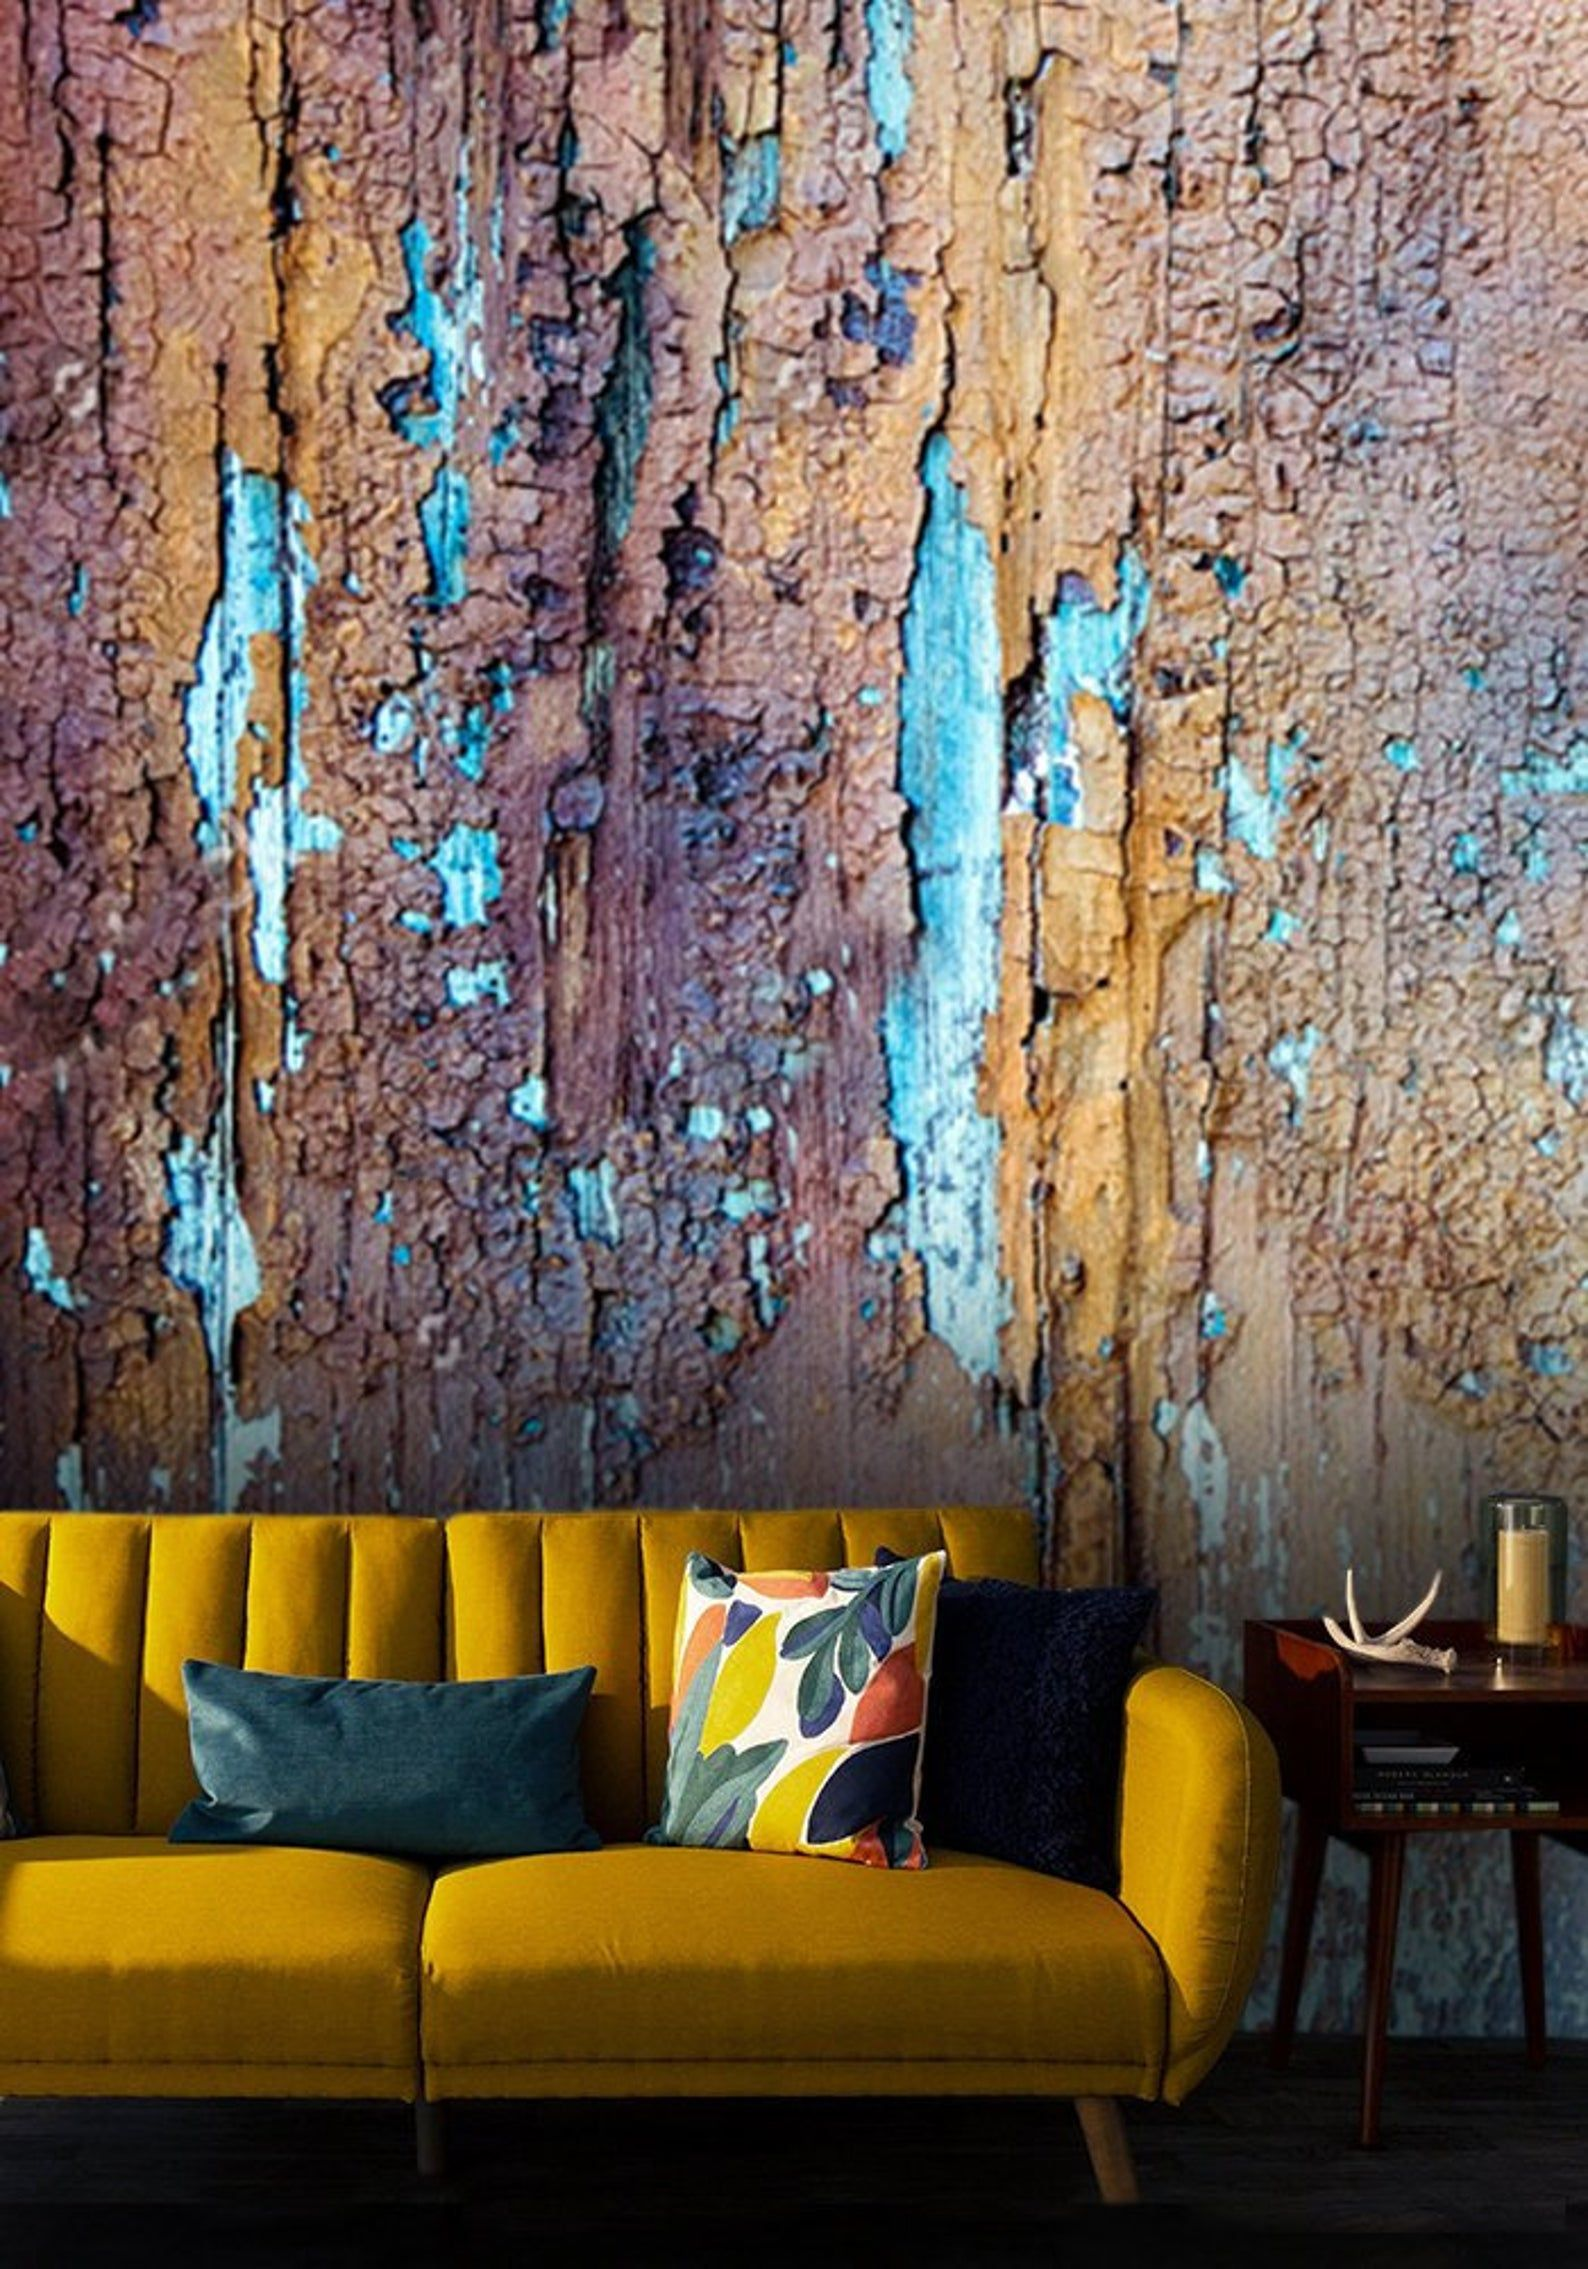 Wallpaper Vinyl Self Adhesive Old Painted Wood Texture Painted Wood Texture Textured Walls Wood Wall Sculpture